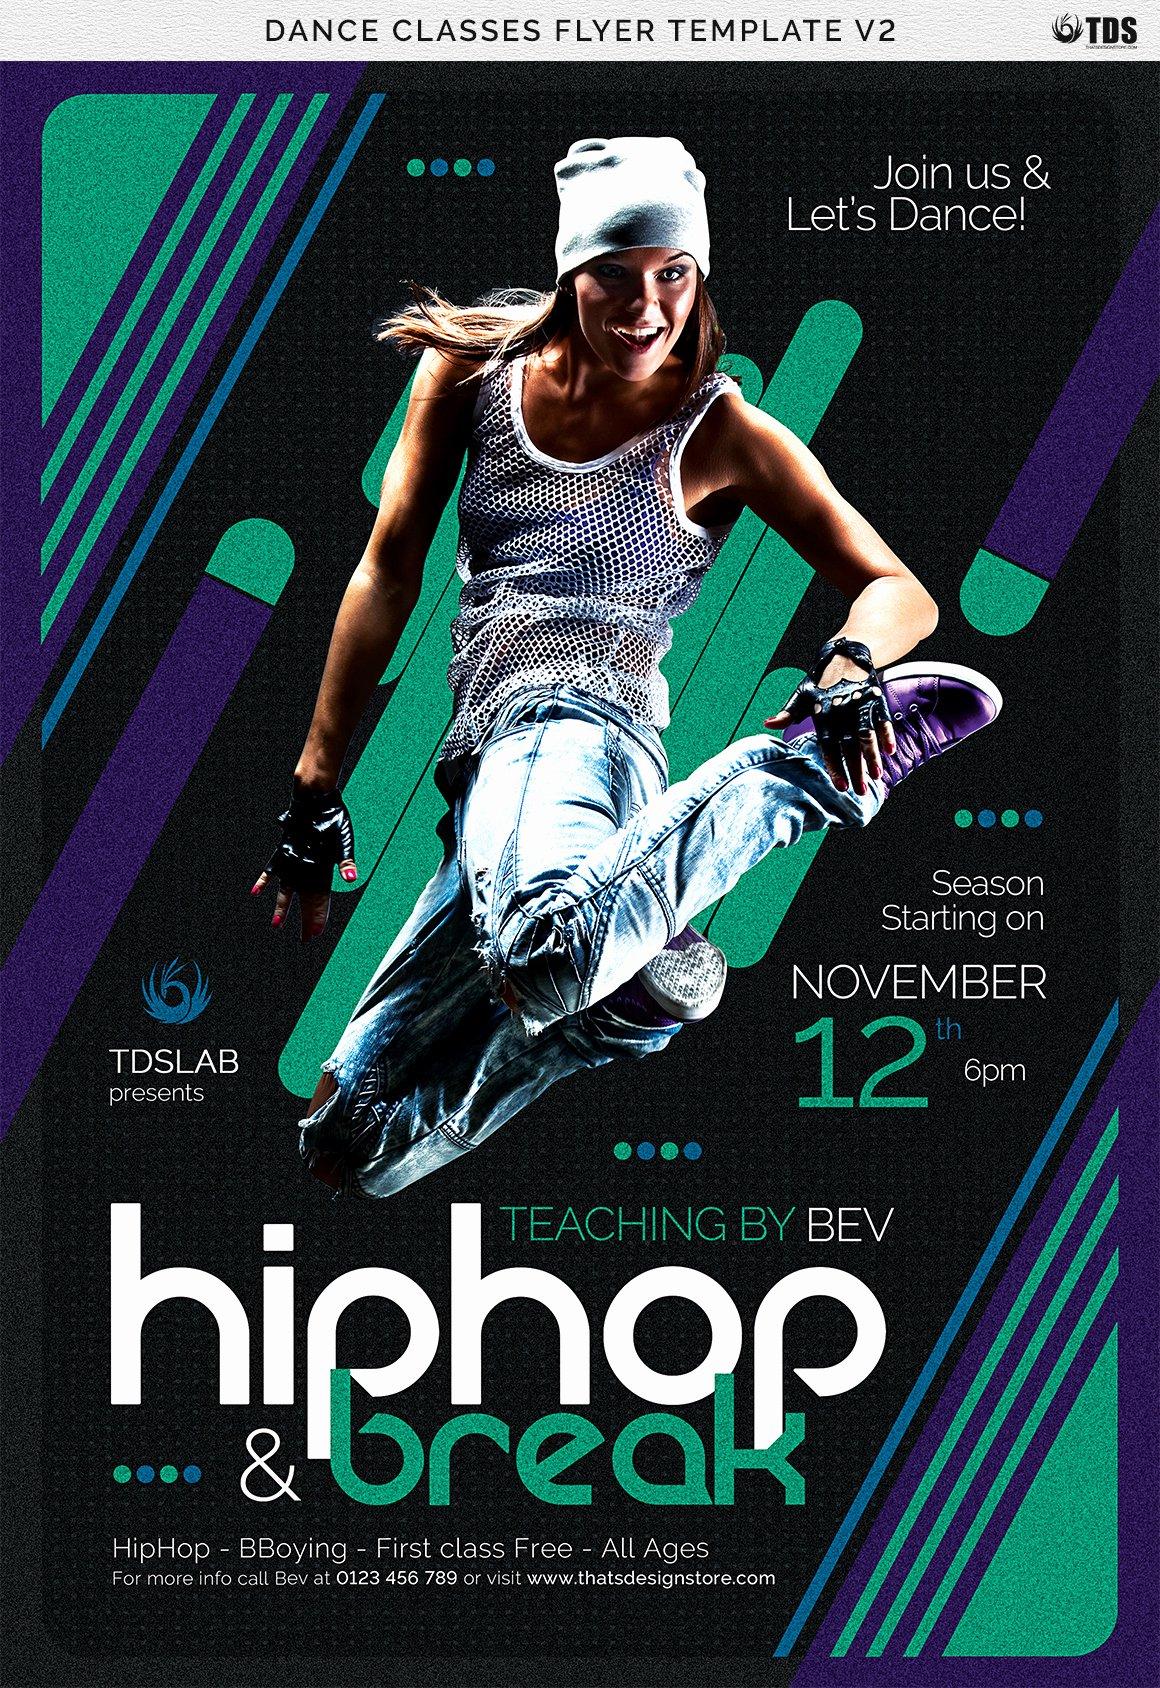 School Dance Flyer Template Inspirational Dance Classes Flyer Template V2